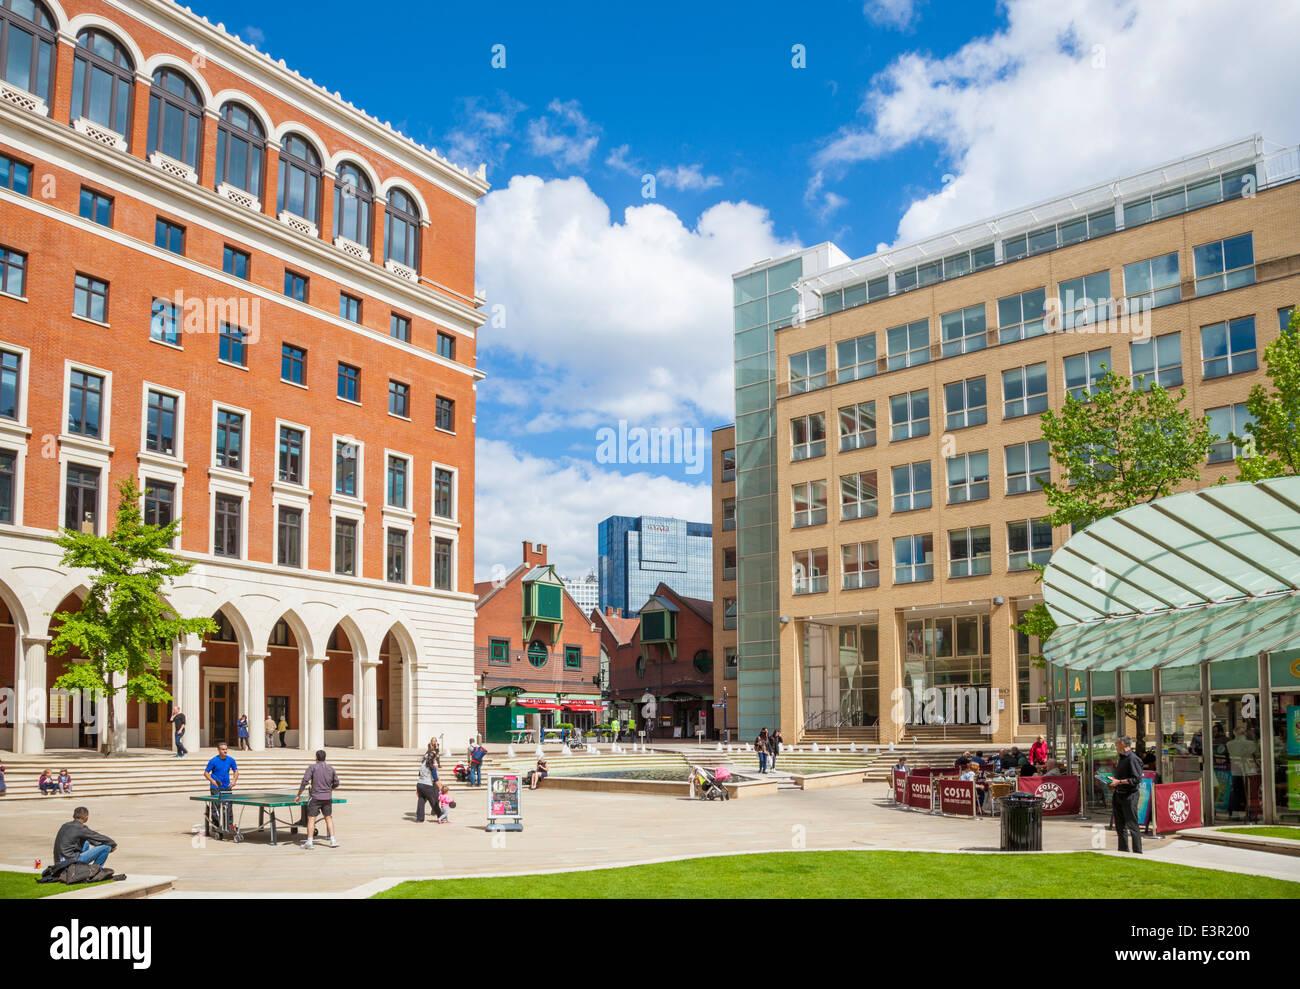 Brindley Place, Birmingham City Centre, West Midlands, England, UK, GB, EU. Europe - Stock Image